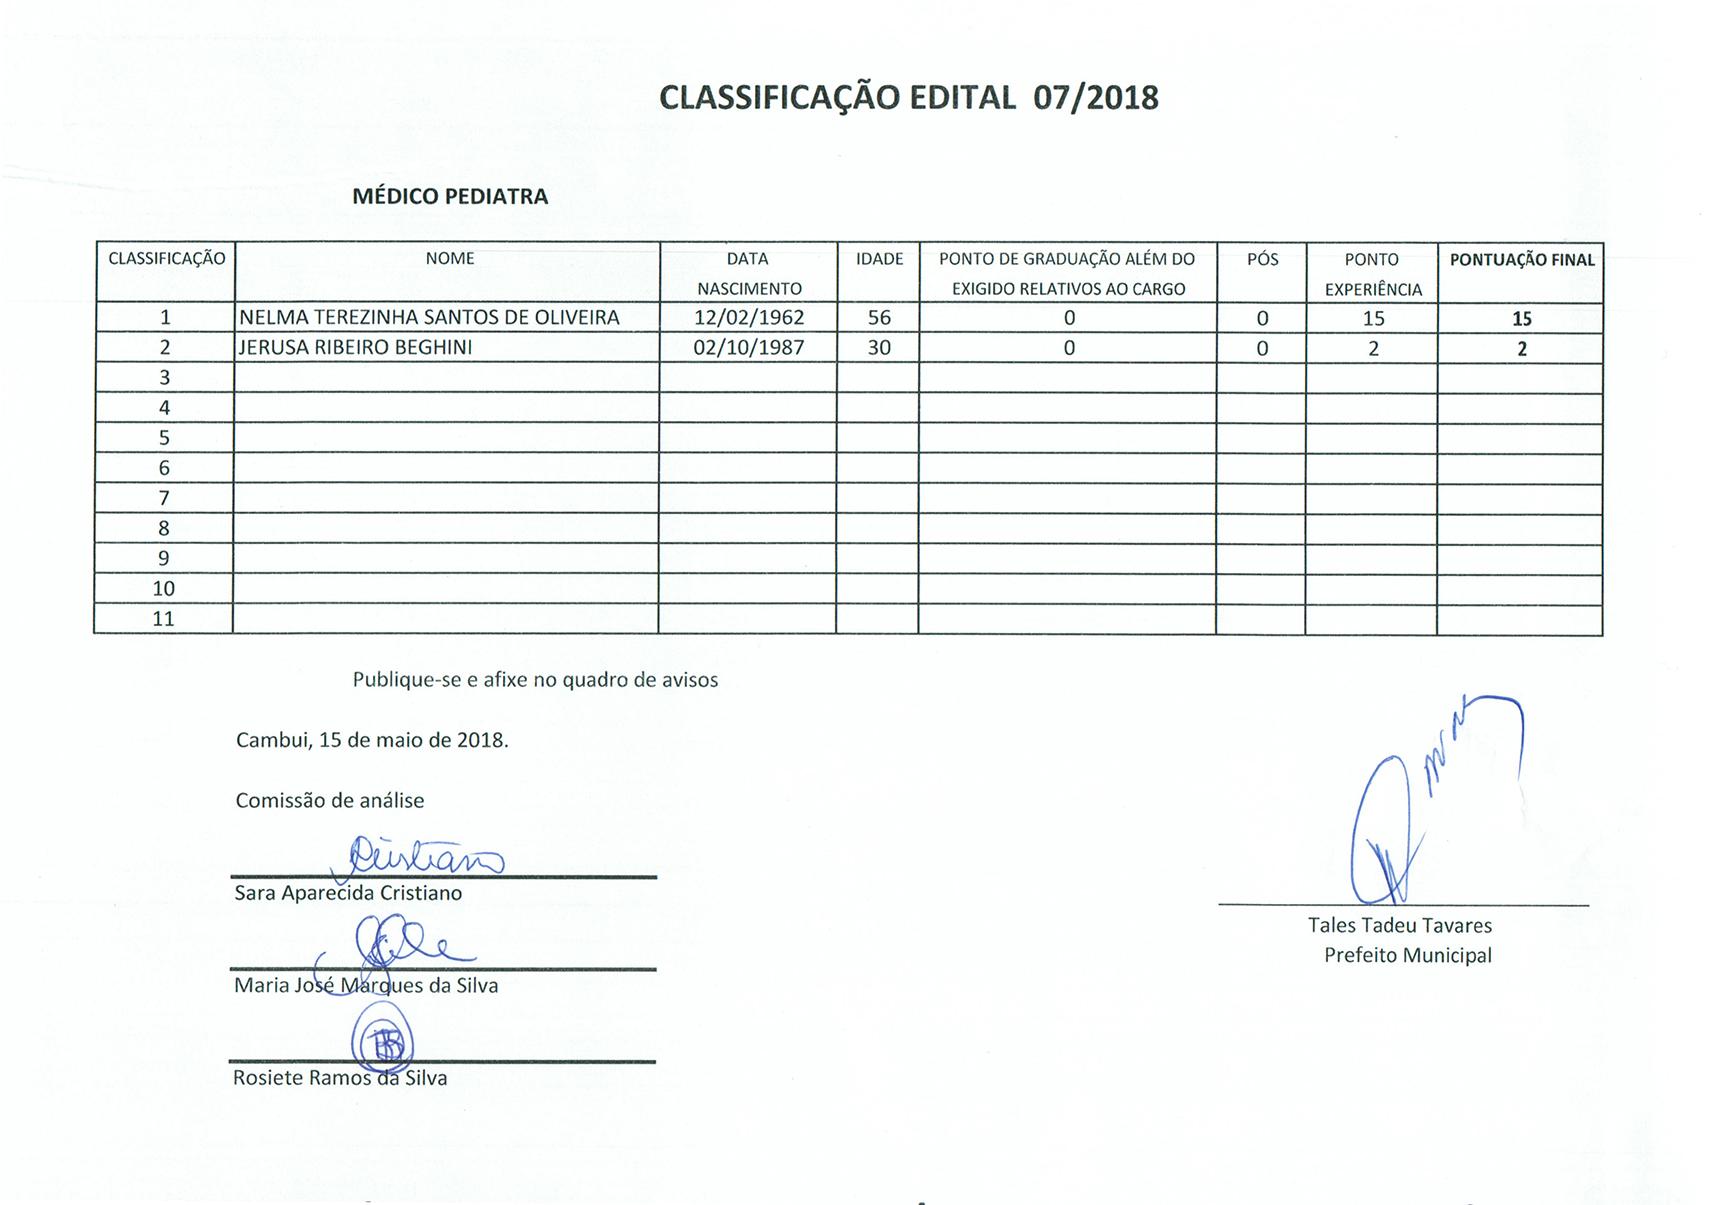 class_edit_07_2018